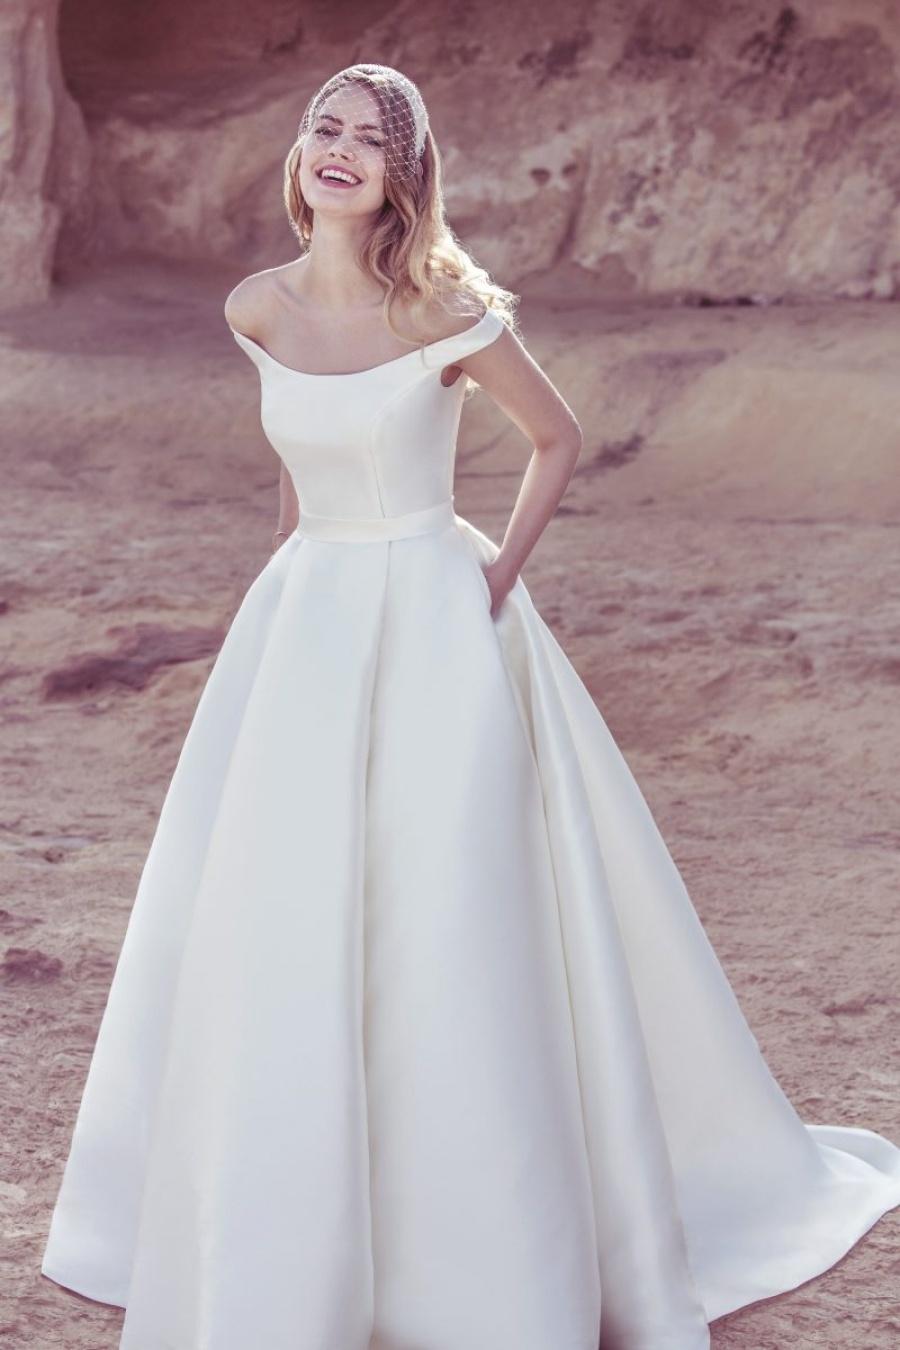 Fairytale Bridal sample sale -- Sample sale in London